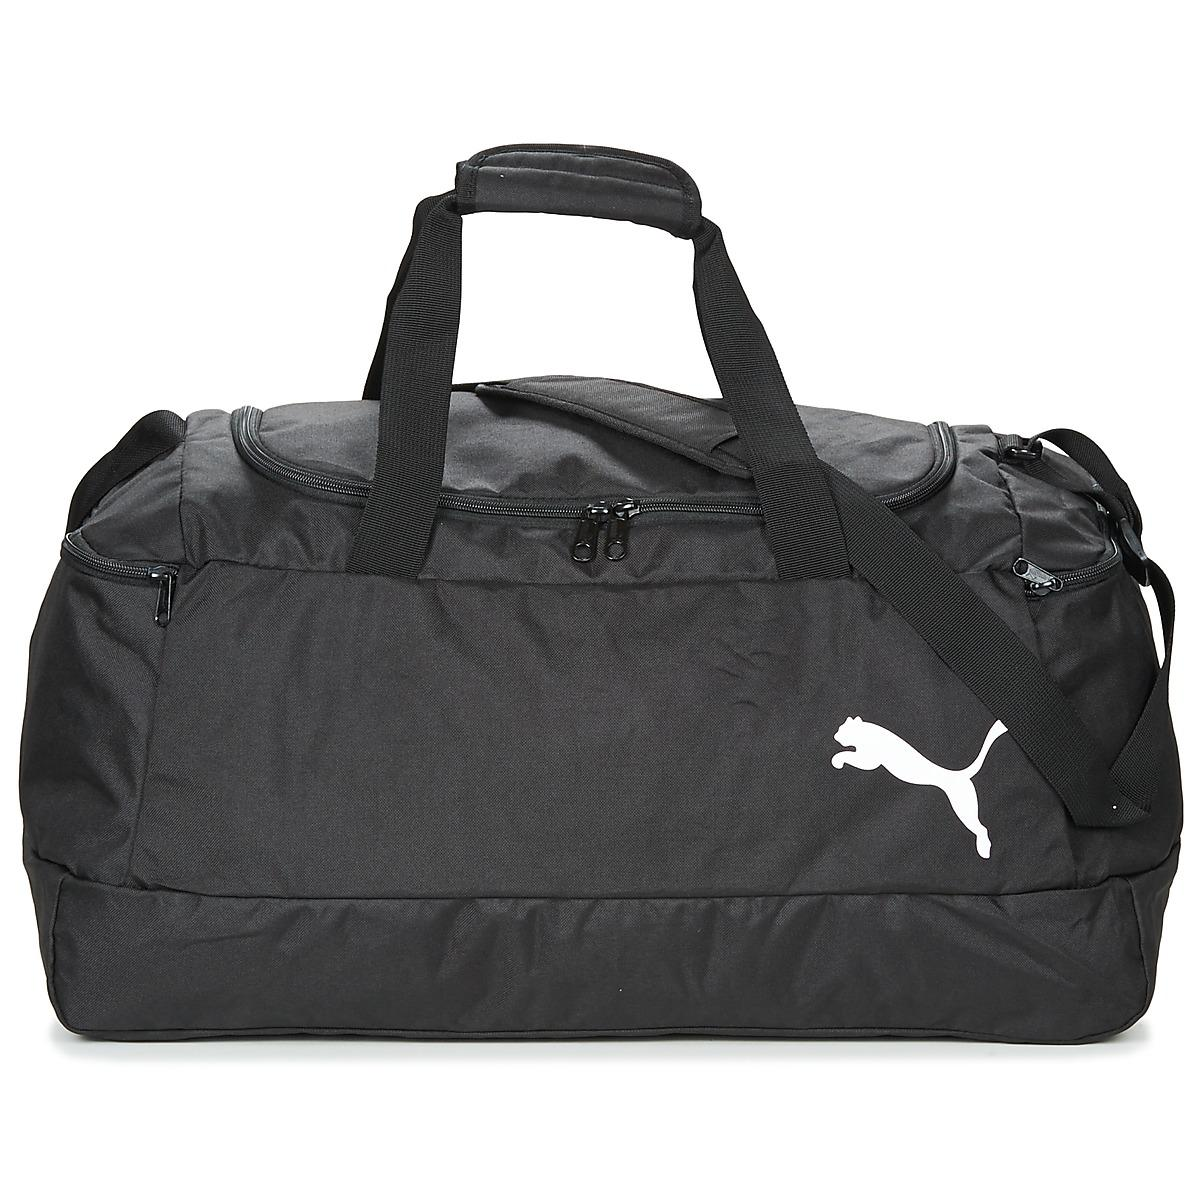 d23fbb00cf Puma Pro Training Ii Medium Bag Women s Sports Bag In Black in Black ...